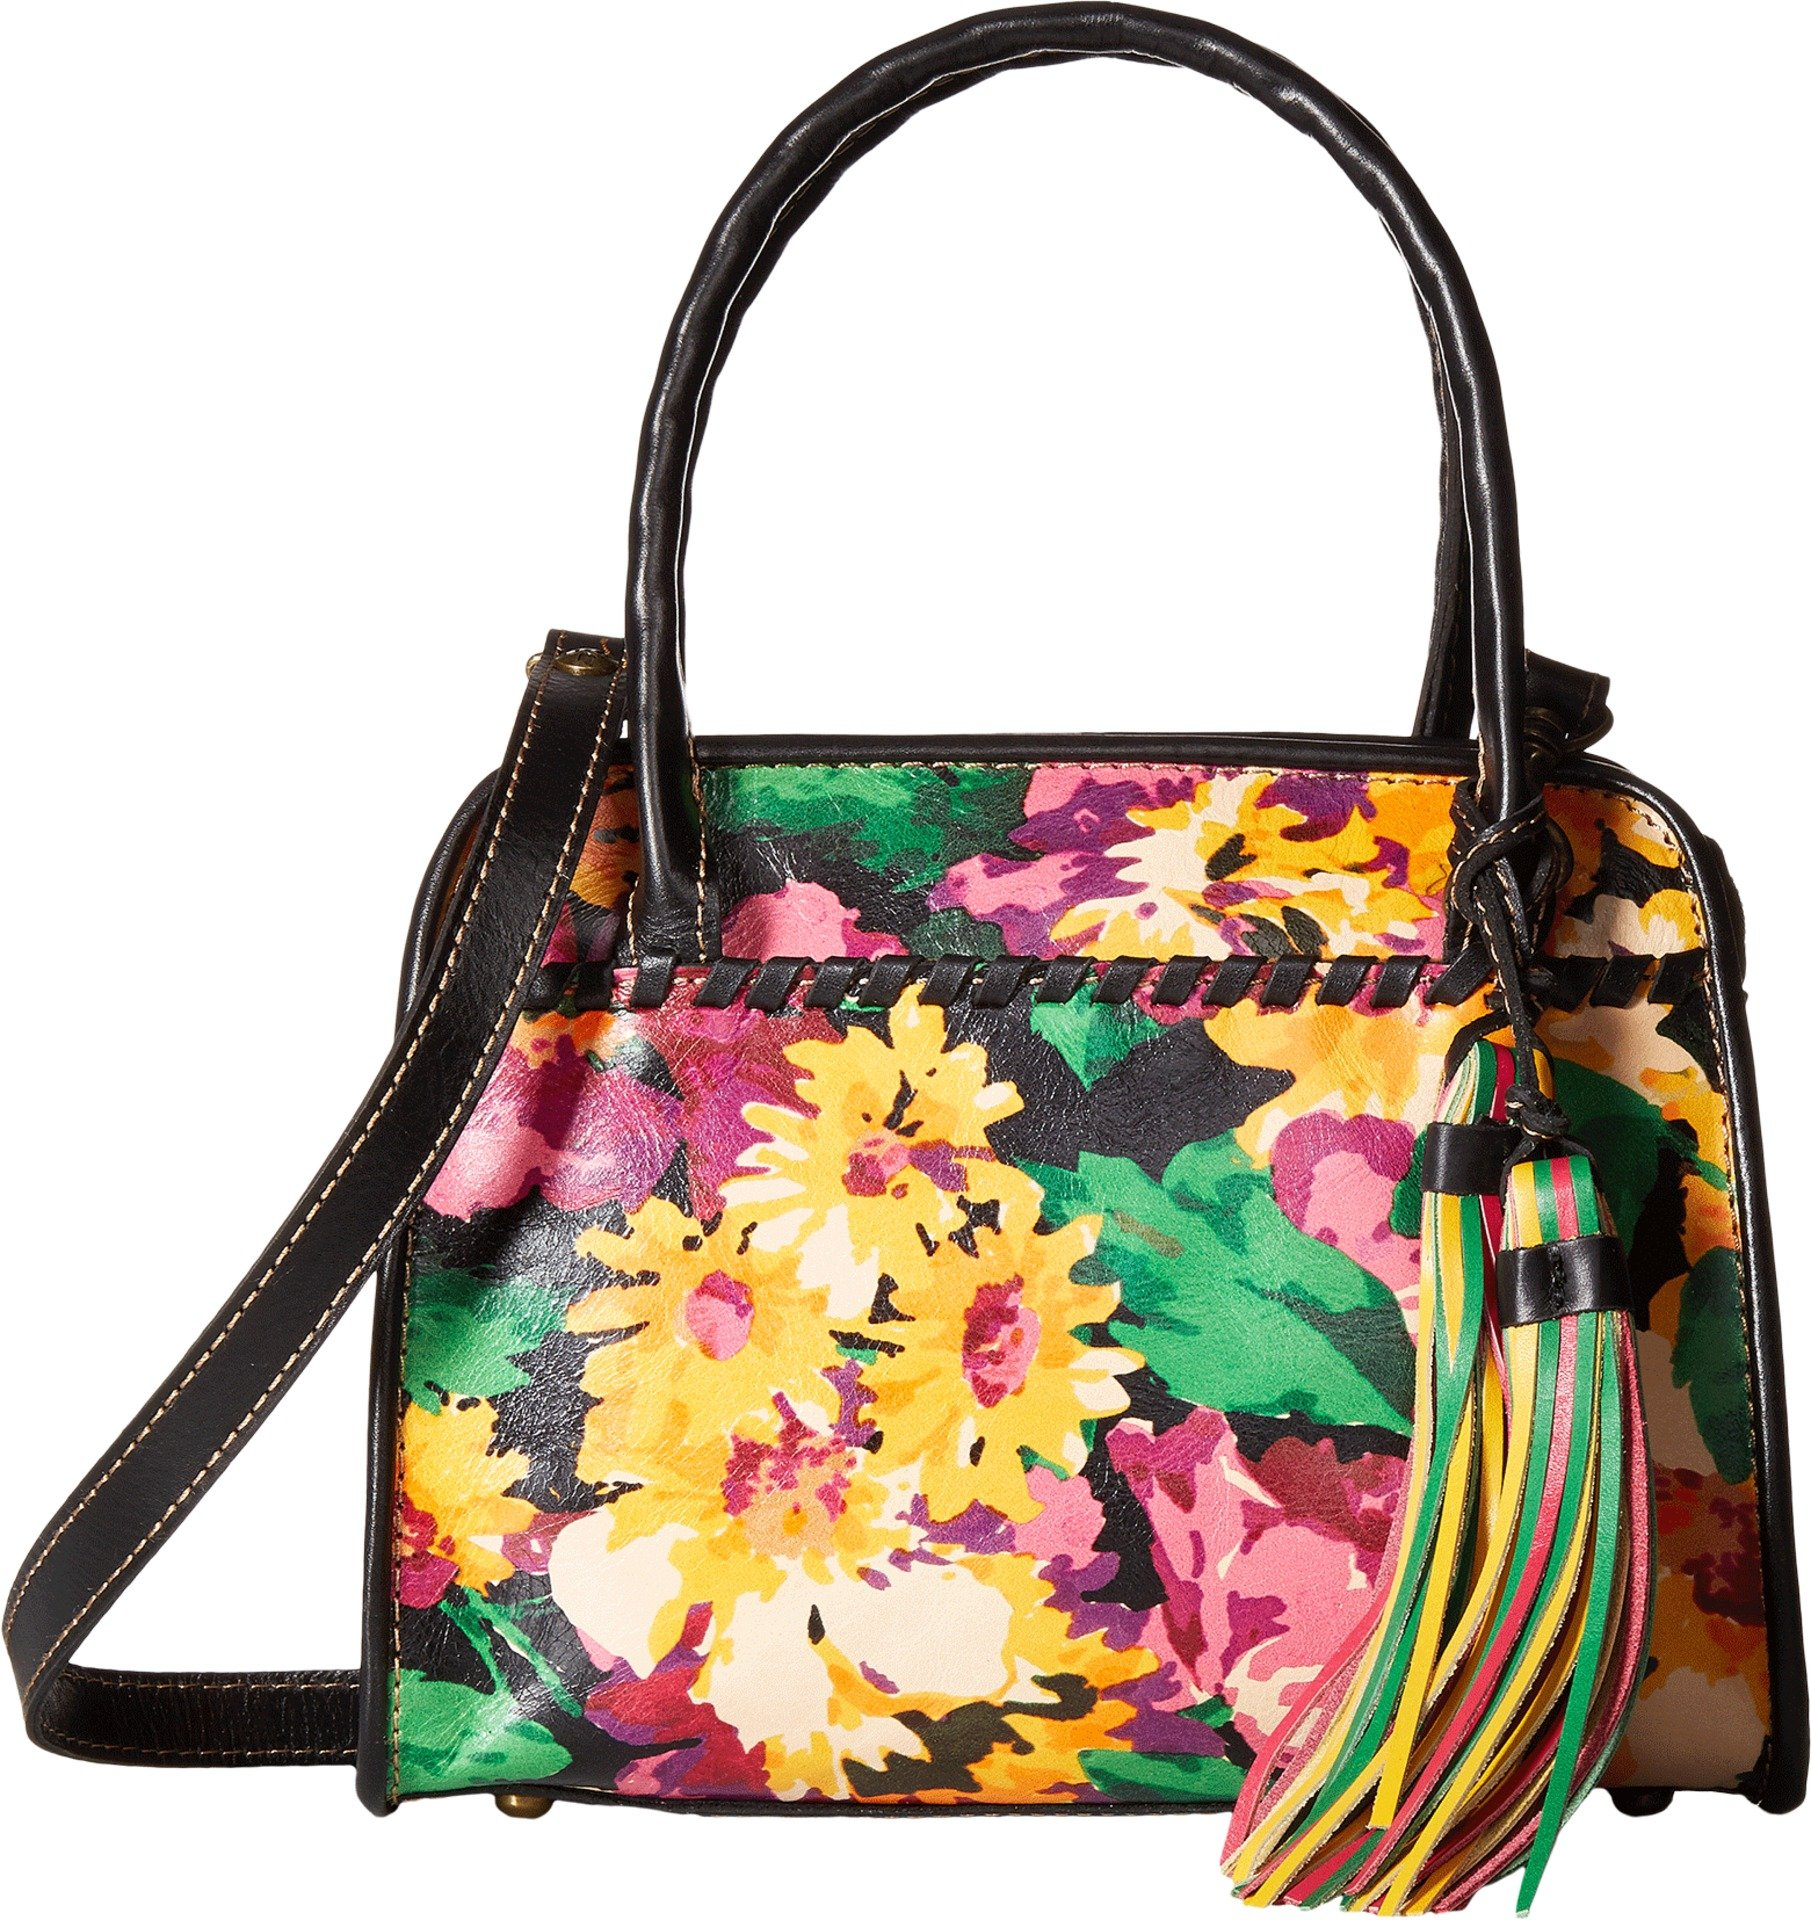 Patricia Nash Women's Paris Satchel Summer Evening Bloom Handbag